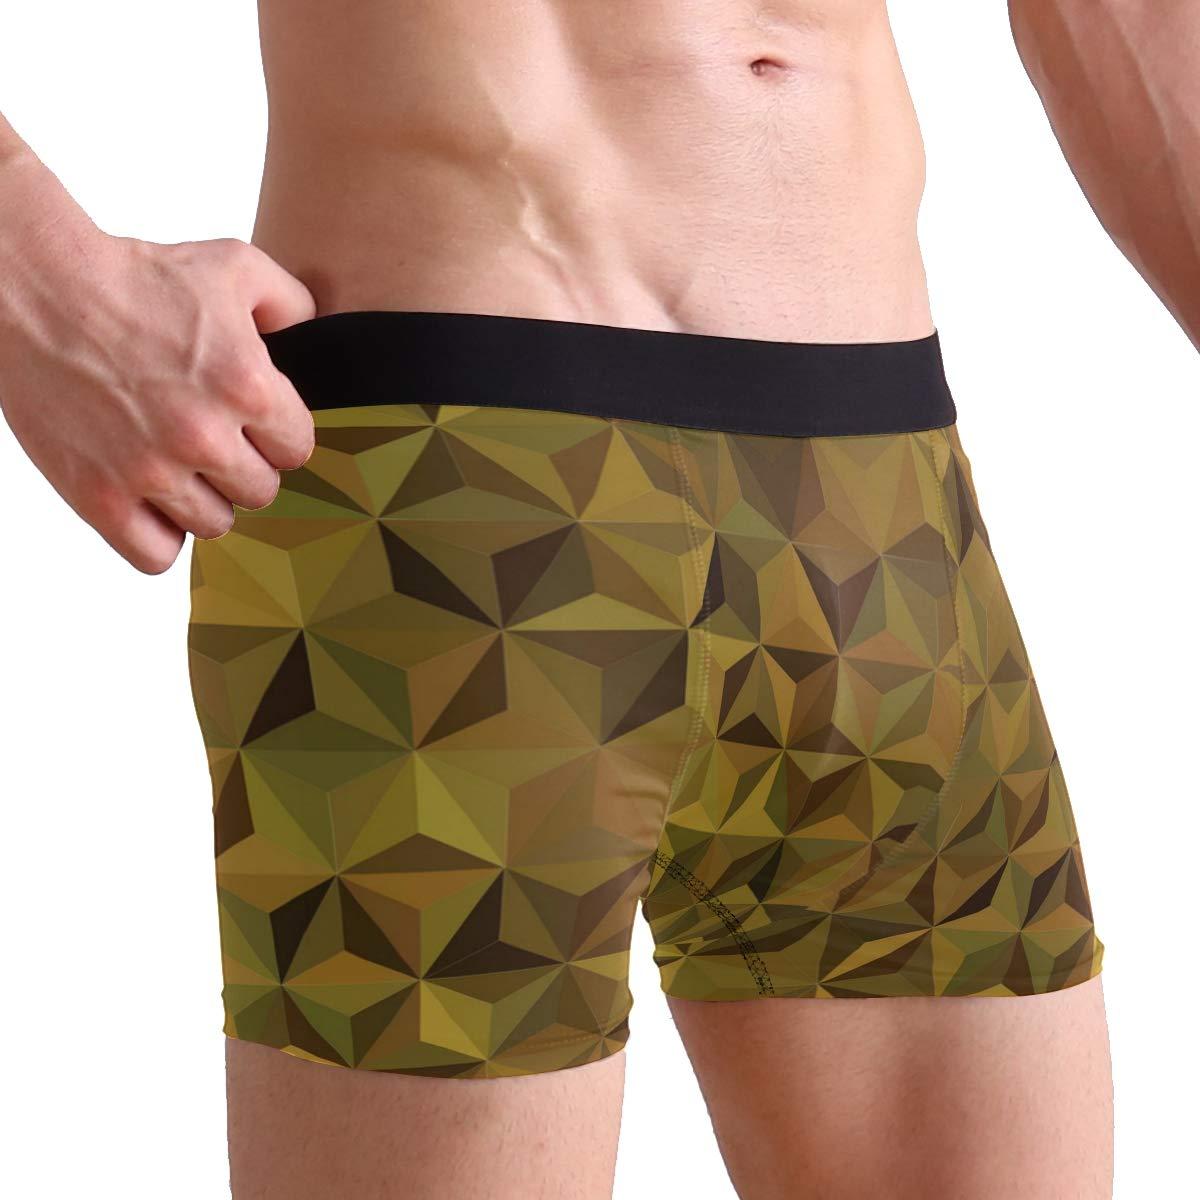 Case Camo Military Camouflage Mens Underwear Mens Bag Soft Cotton Underwear 2 Pack